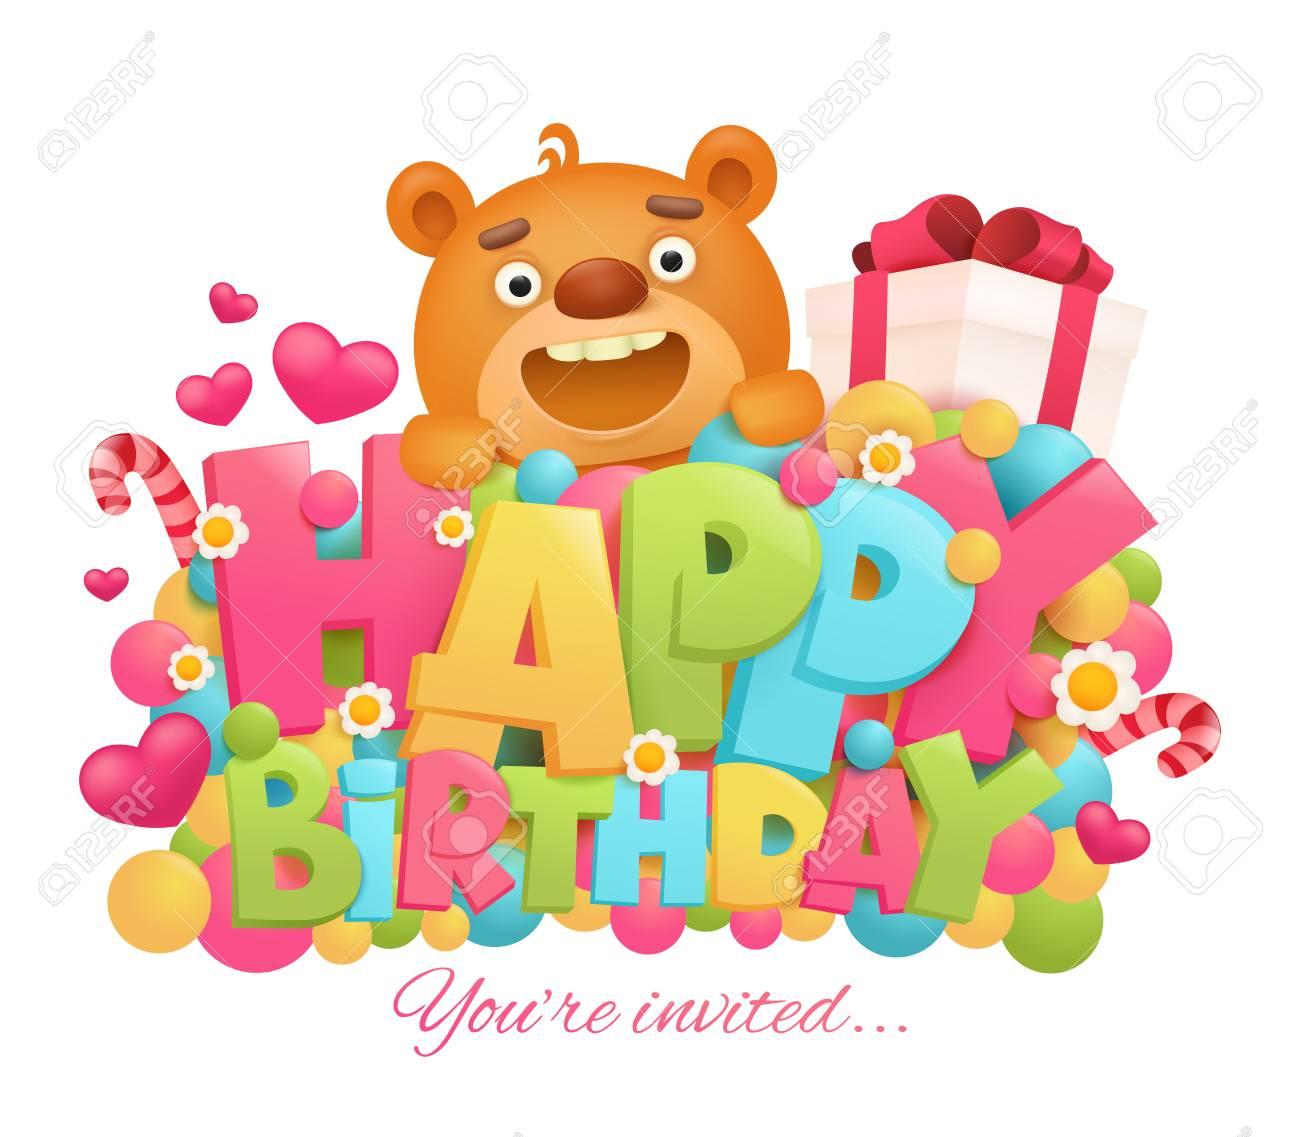 Happy Birthday Greeting Card With Cartoon Teddy Bear Character